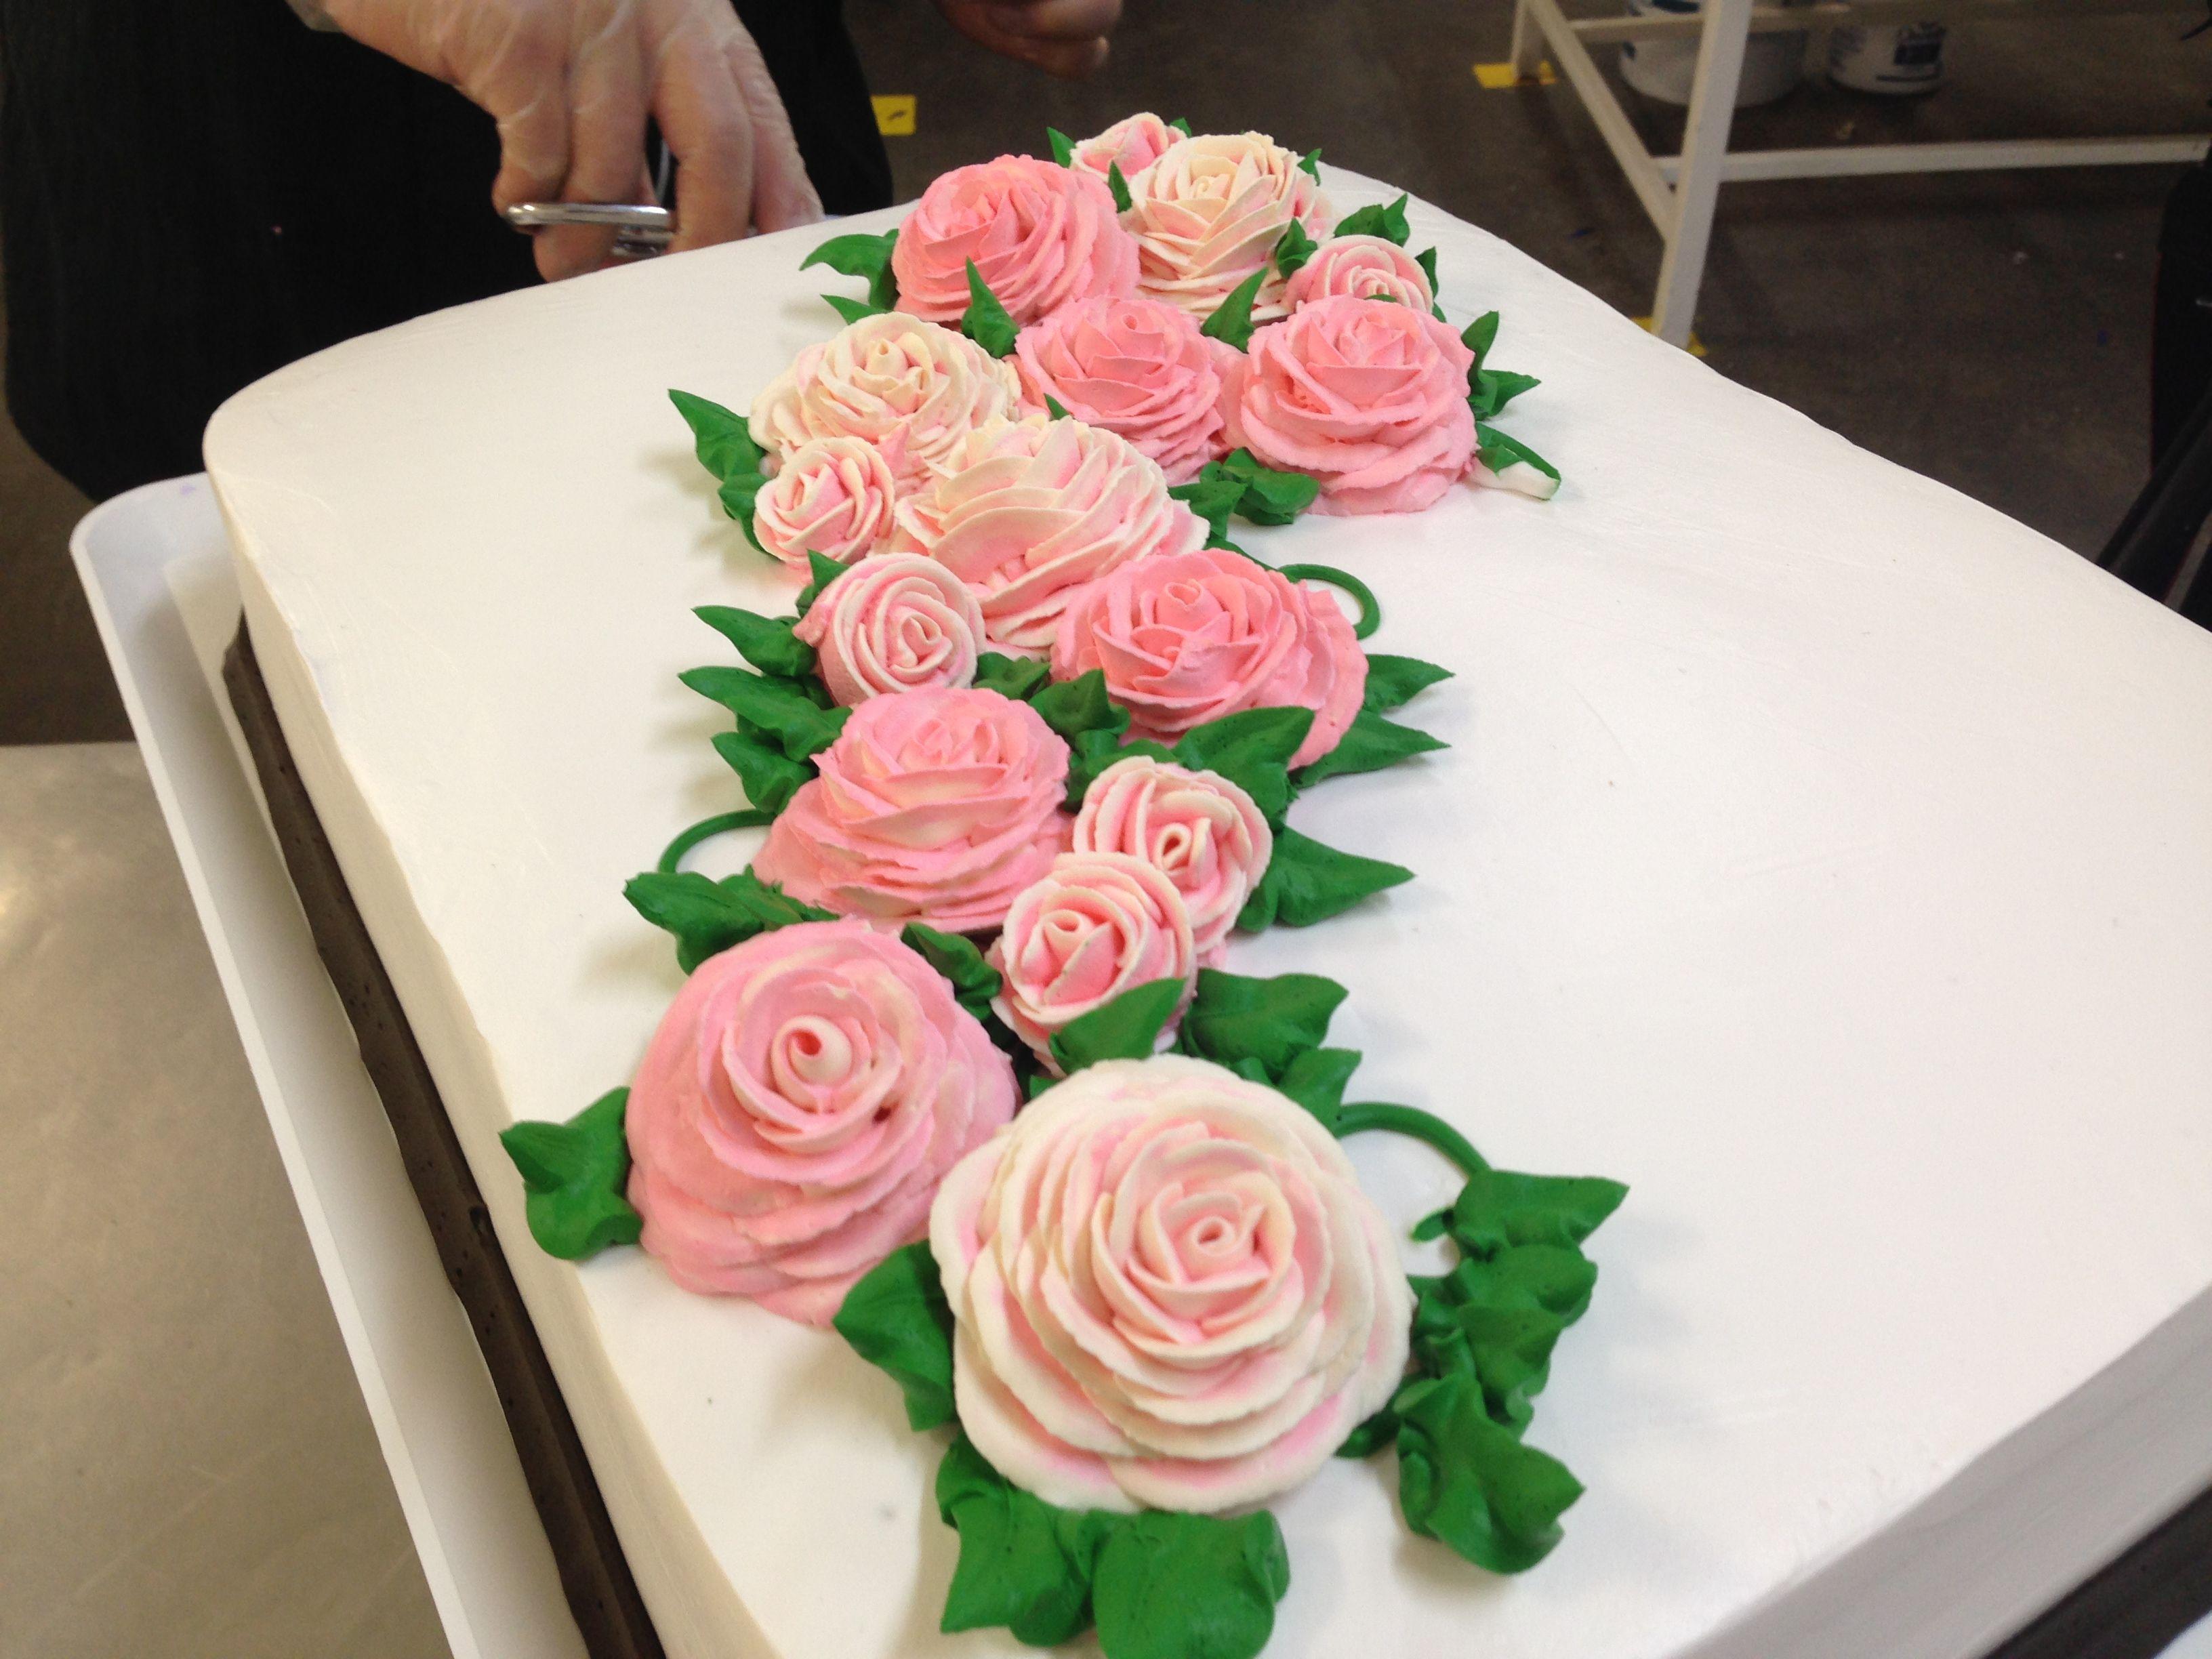 Pastel Especial Tres Leches Decoracin Con Rosas De Crema